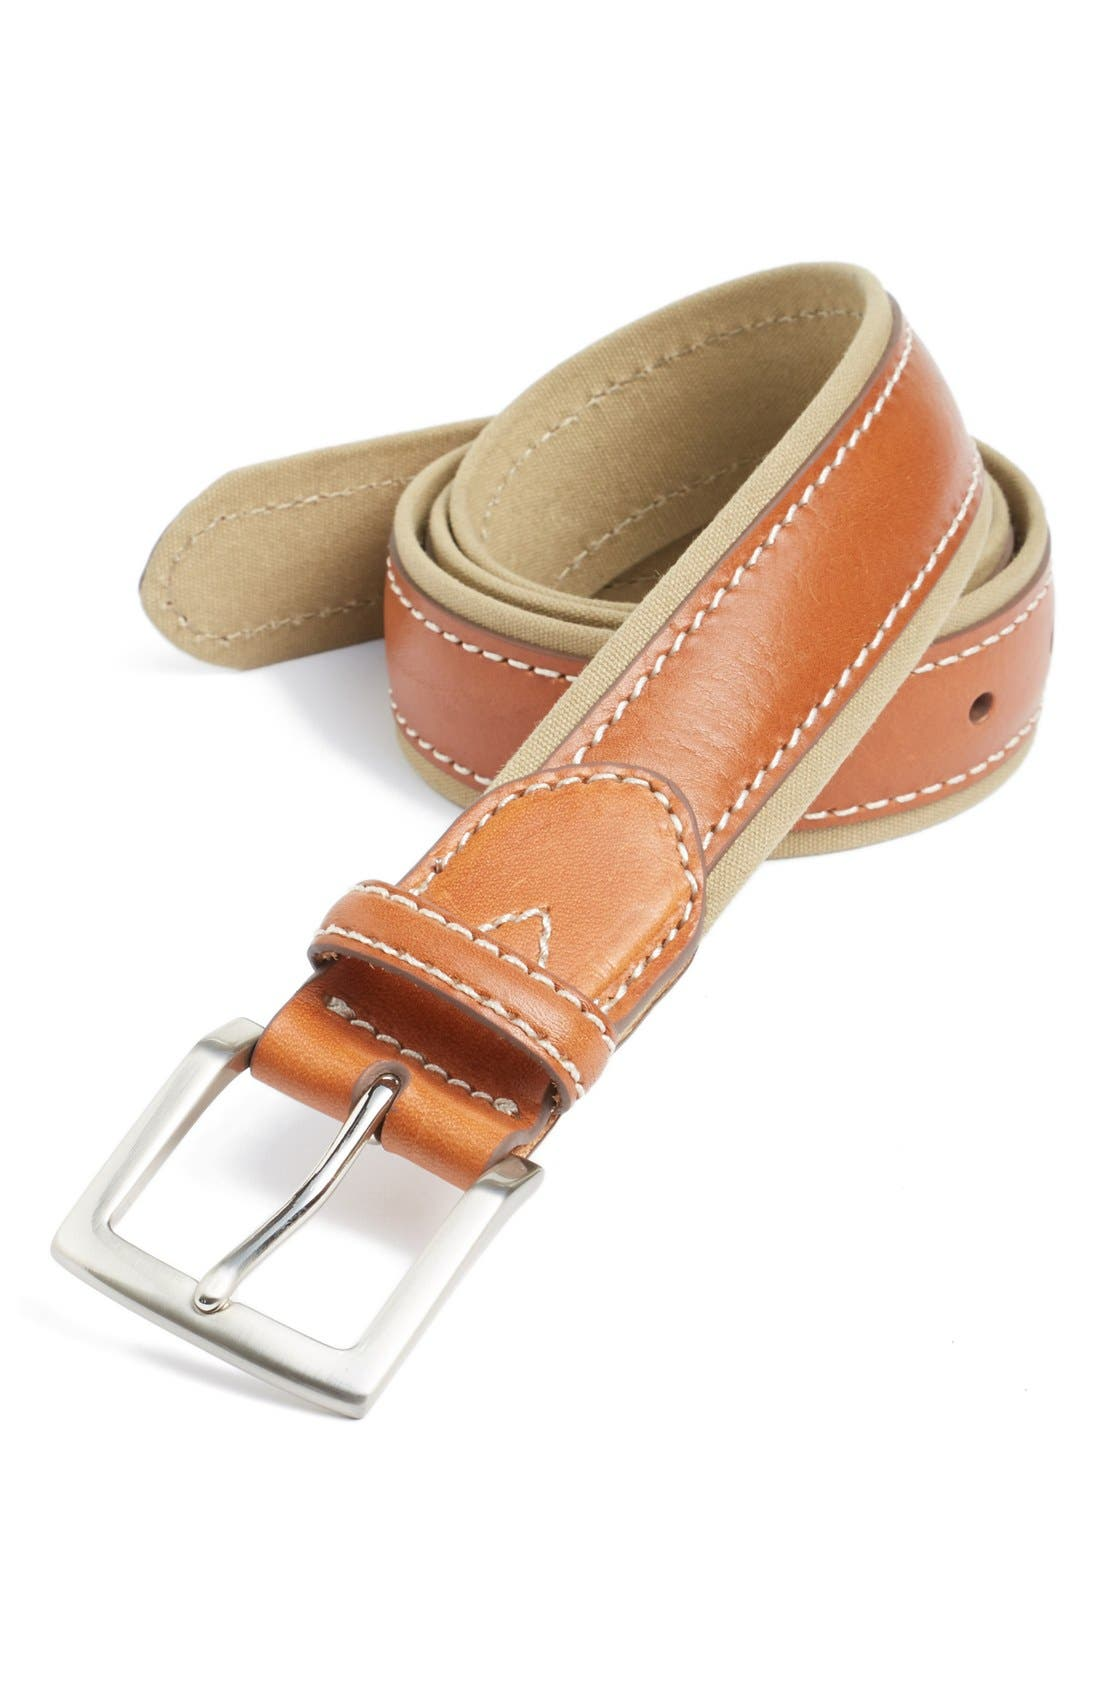 Alternate Image 1 Selected - Tommy Bahama 'Kayak' Belt